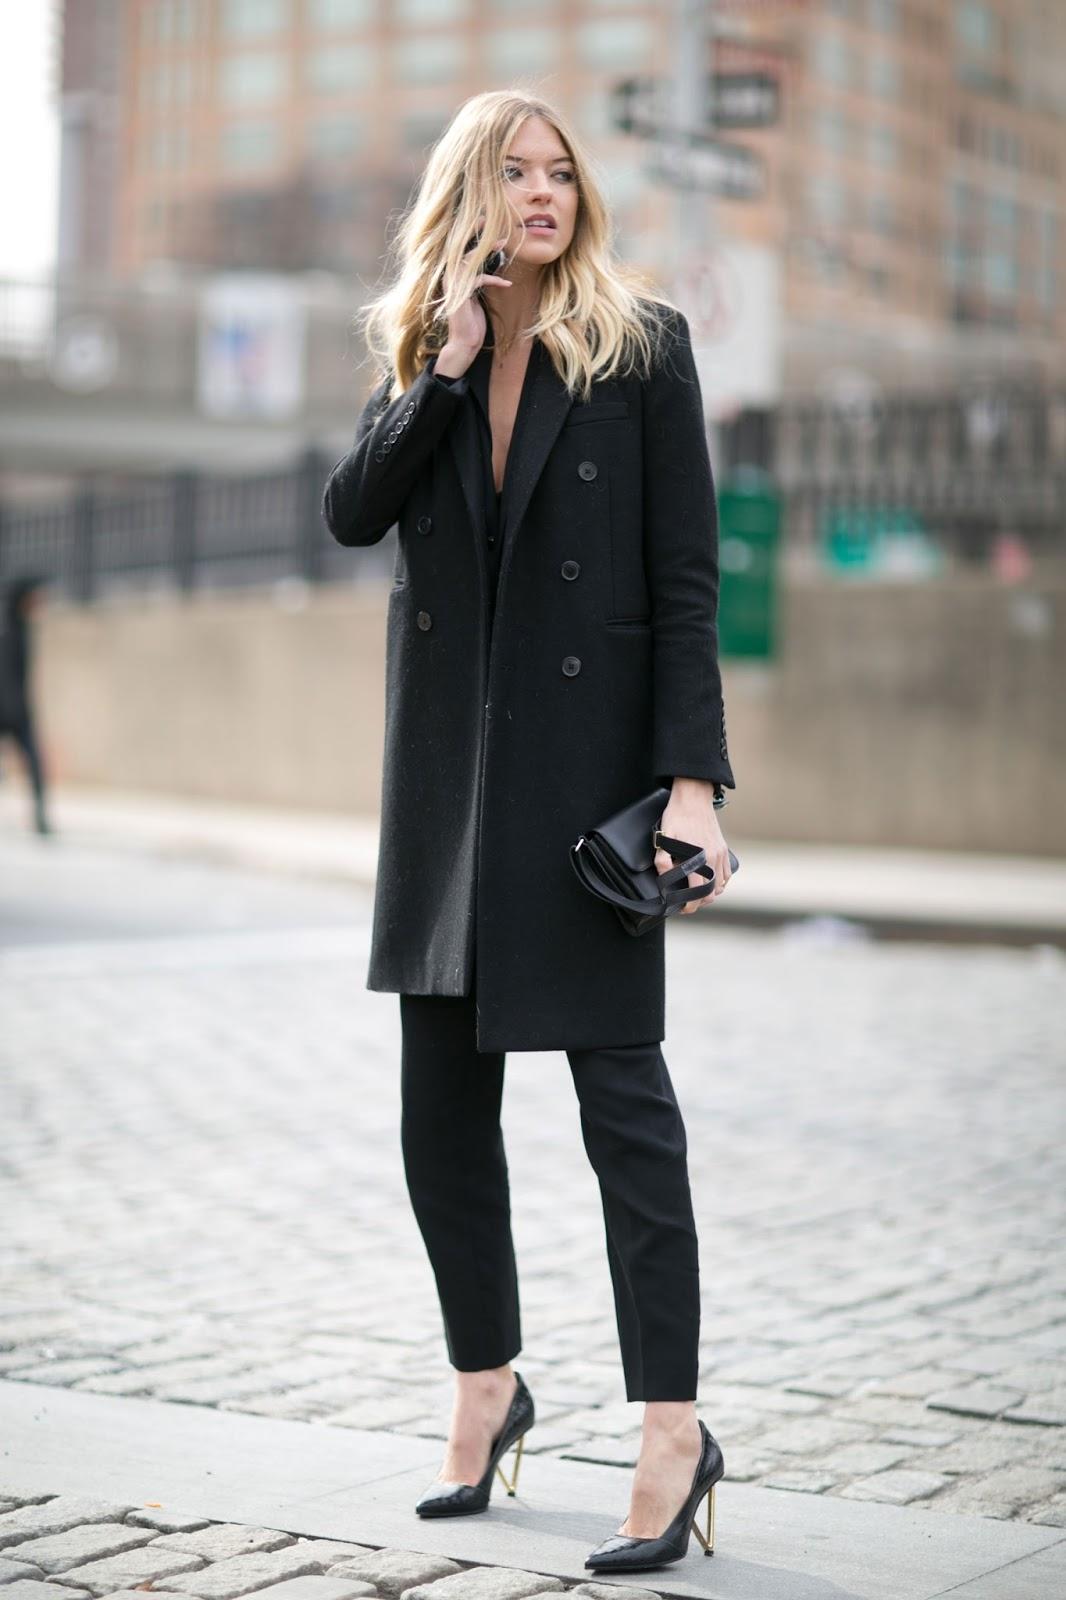 New York Fall Fashion Street Style